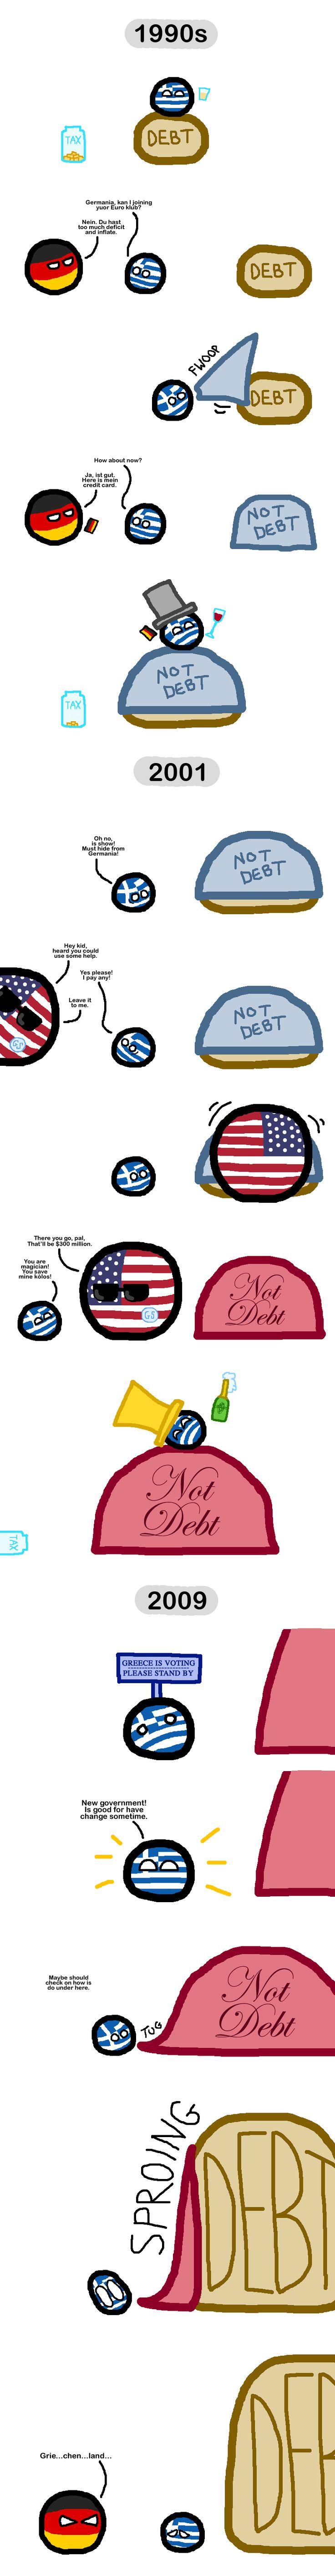 The Eurozone Crisis: Greece's Gambit ( Greece, Germany, USA ) by thesunisup  #polandball #countryball